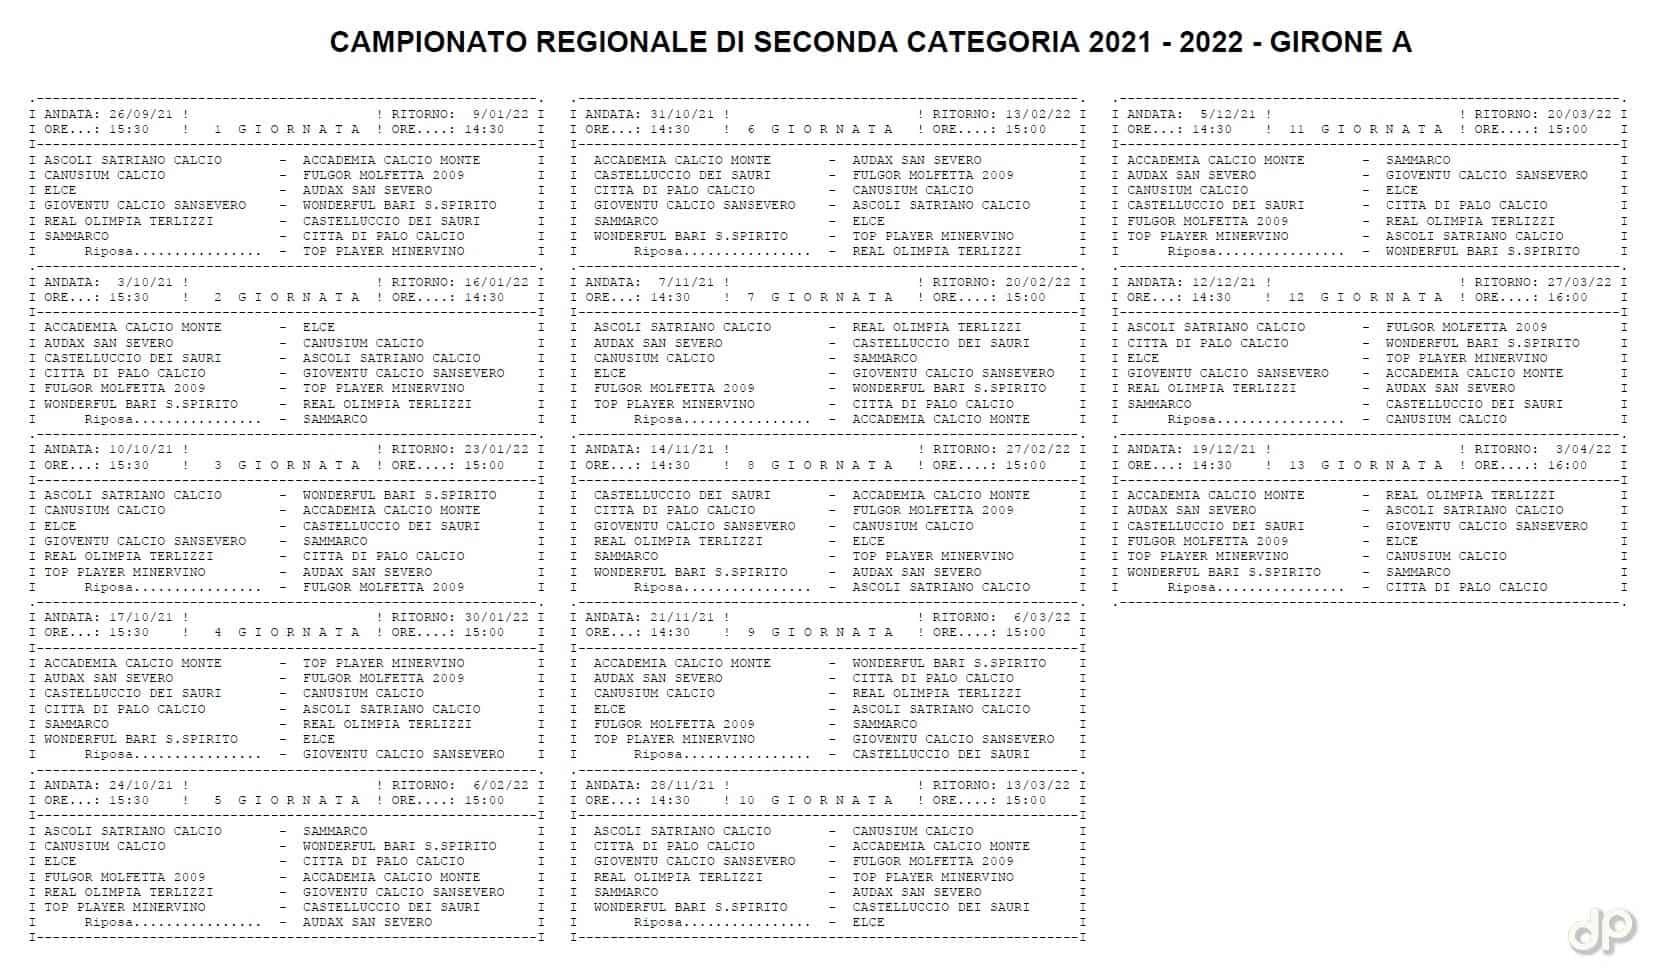 Calendario Seconda Categoria pugliese girone A 2021-22